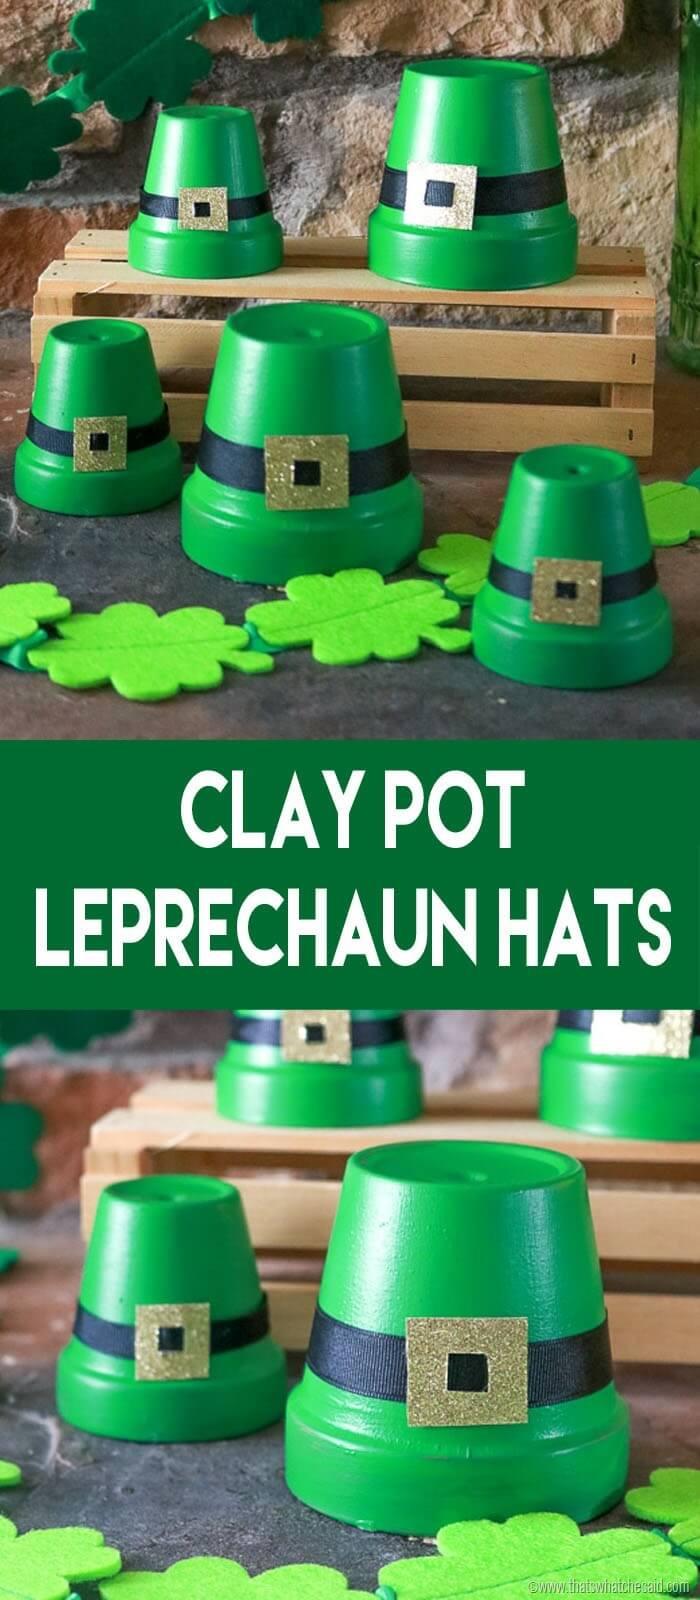 Leprechaun Hats made from clay pots